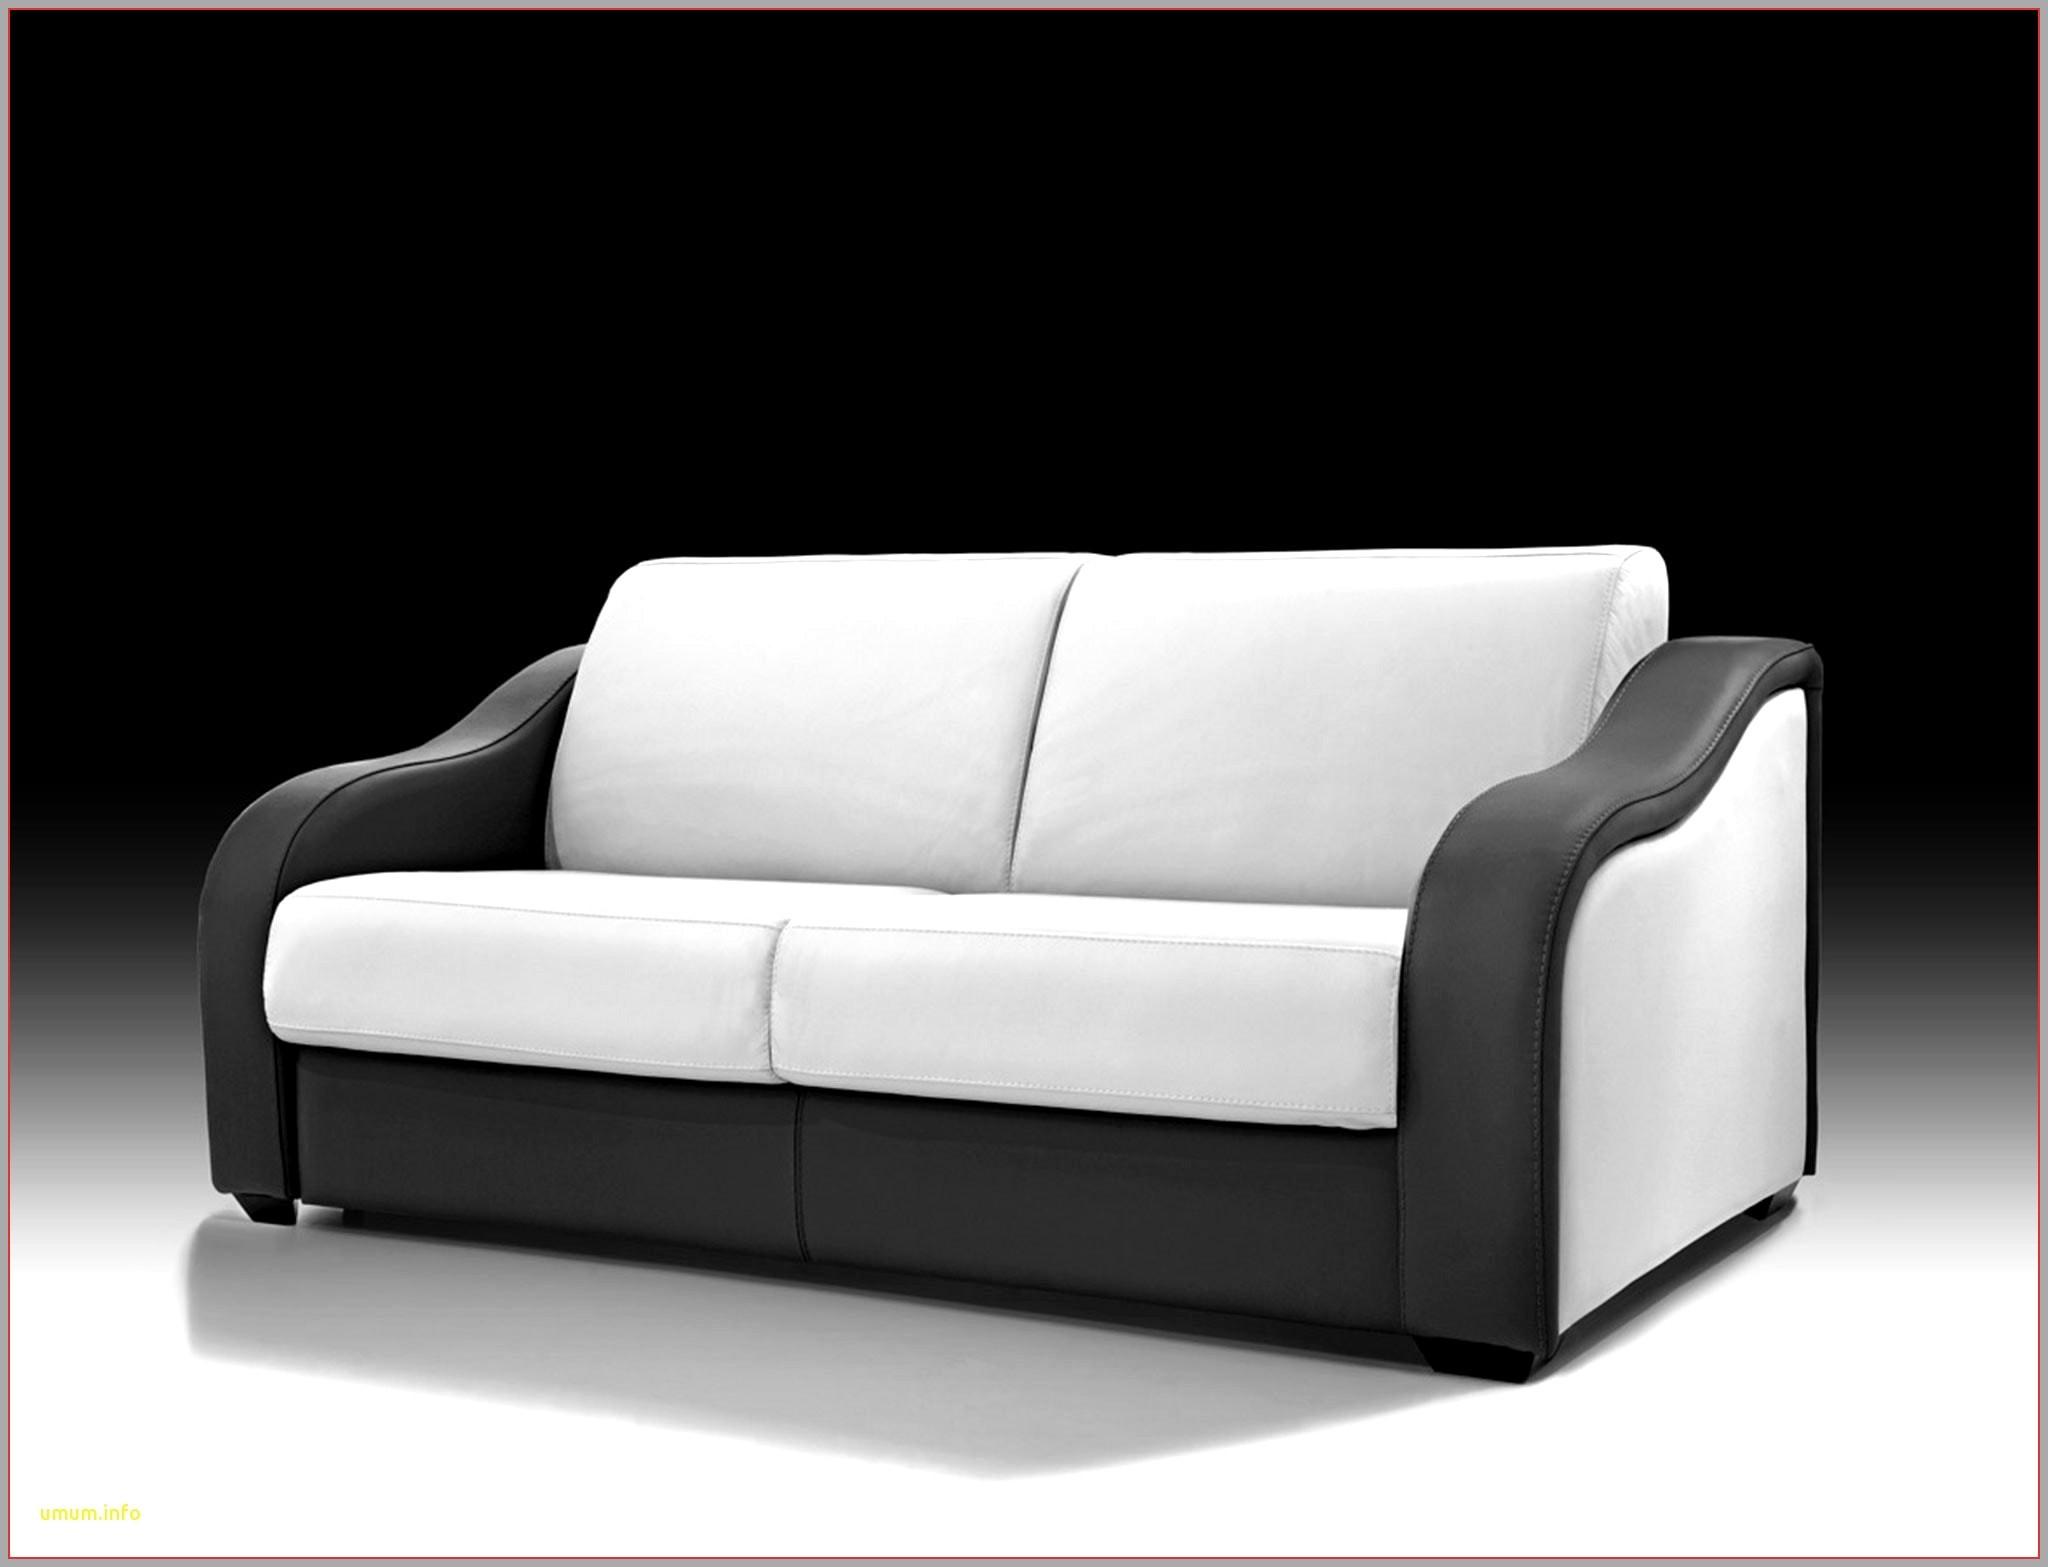 Ikea Canapé D Angle Convertible Impressionnant Galerie Ikea Salon En Cuir